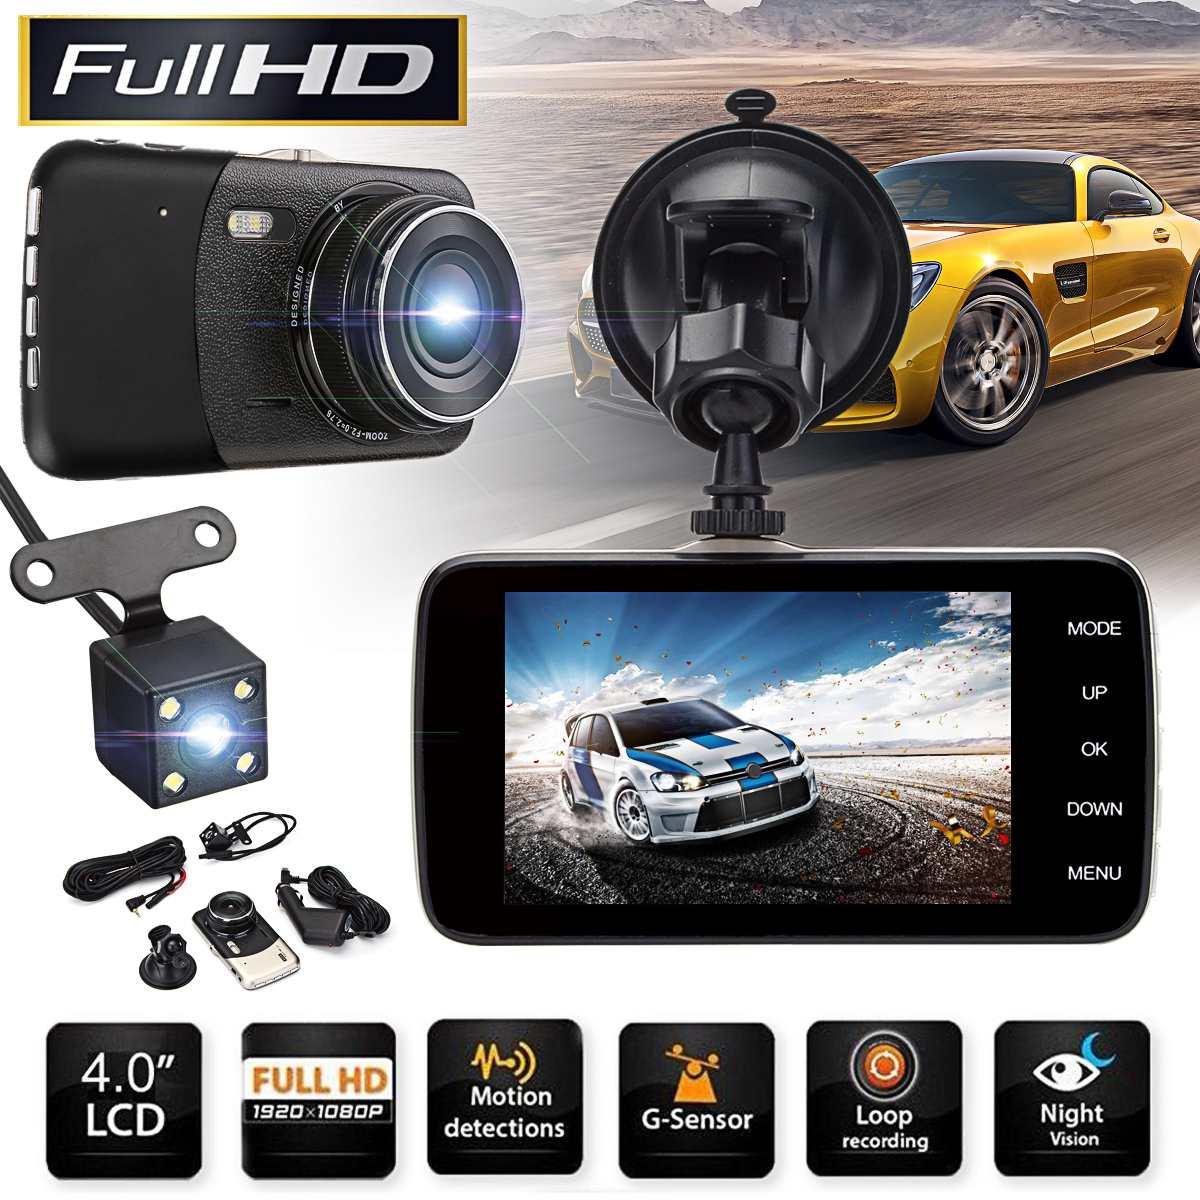 Dual Lens Dash Camera Cam 4.0 Car DVR Full HD 1920*1080P Digital Video Recorder Camcorder with Rear view Auto Night VisionDual Lens Dash Camera Cam 4.0 Car DVR Full HD 1920*1080P Digital Video Recorder Camcorder with Rear view Auto Night Vision